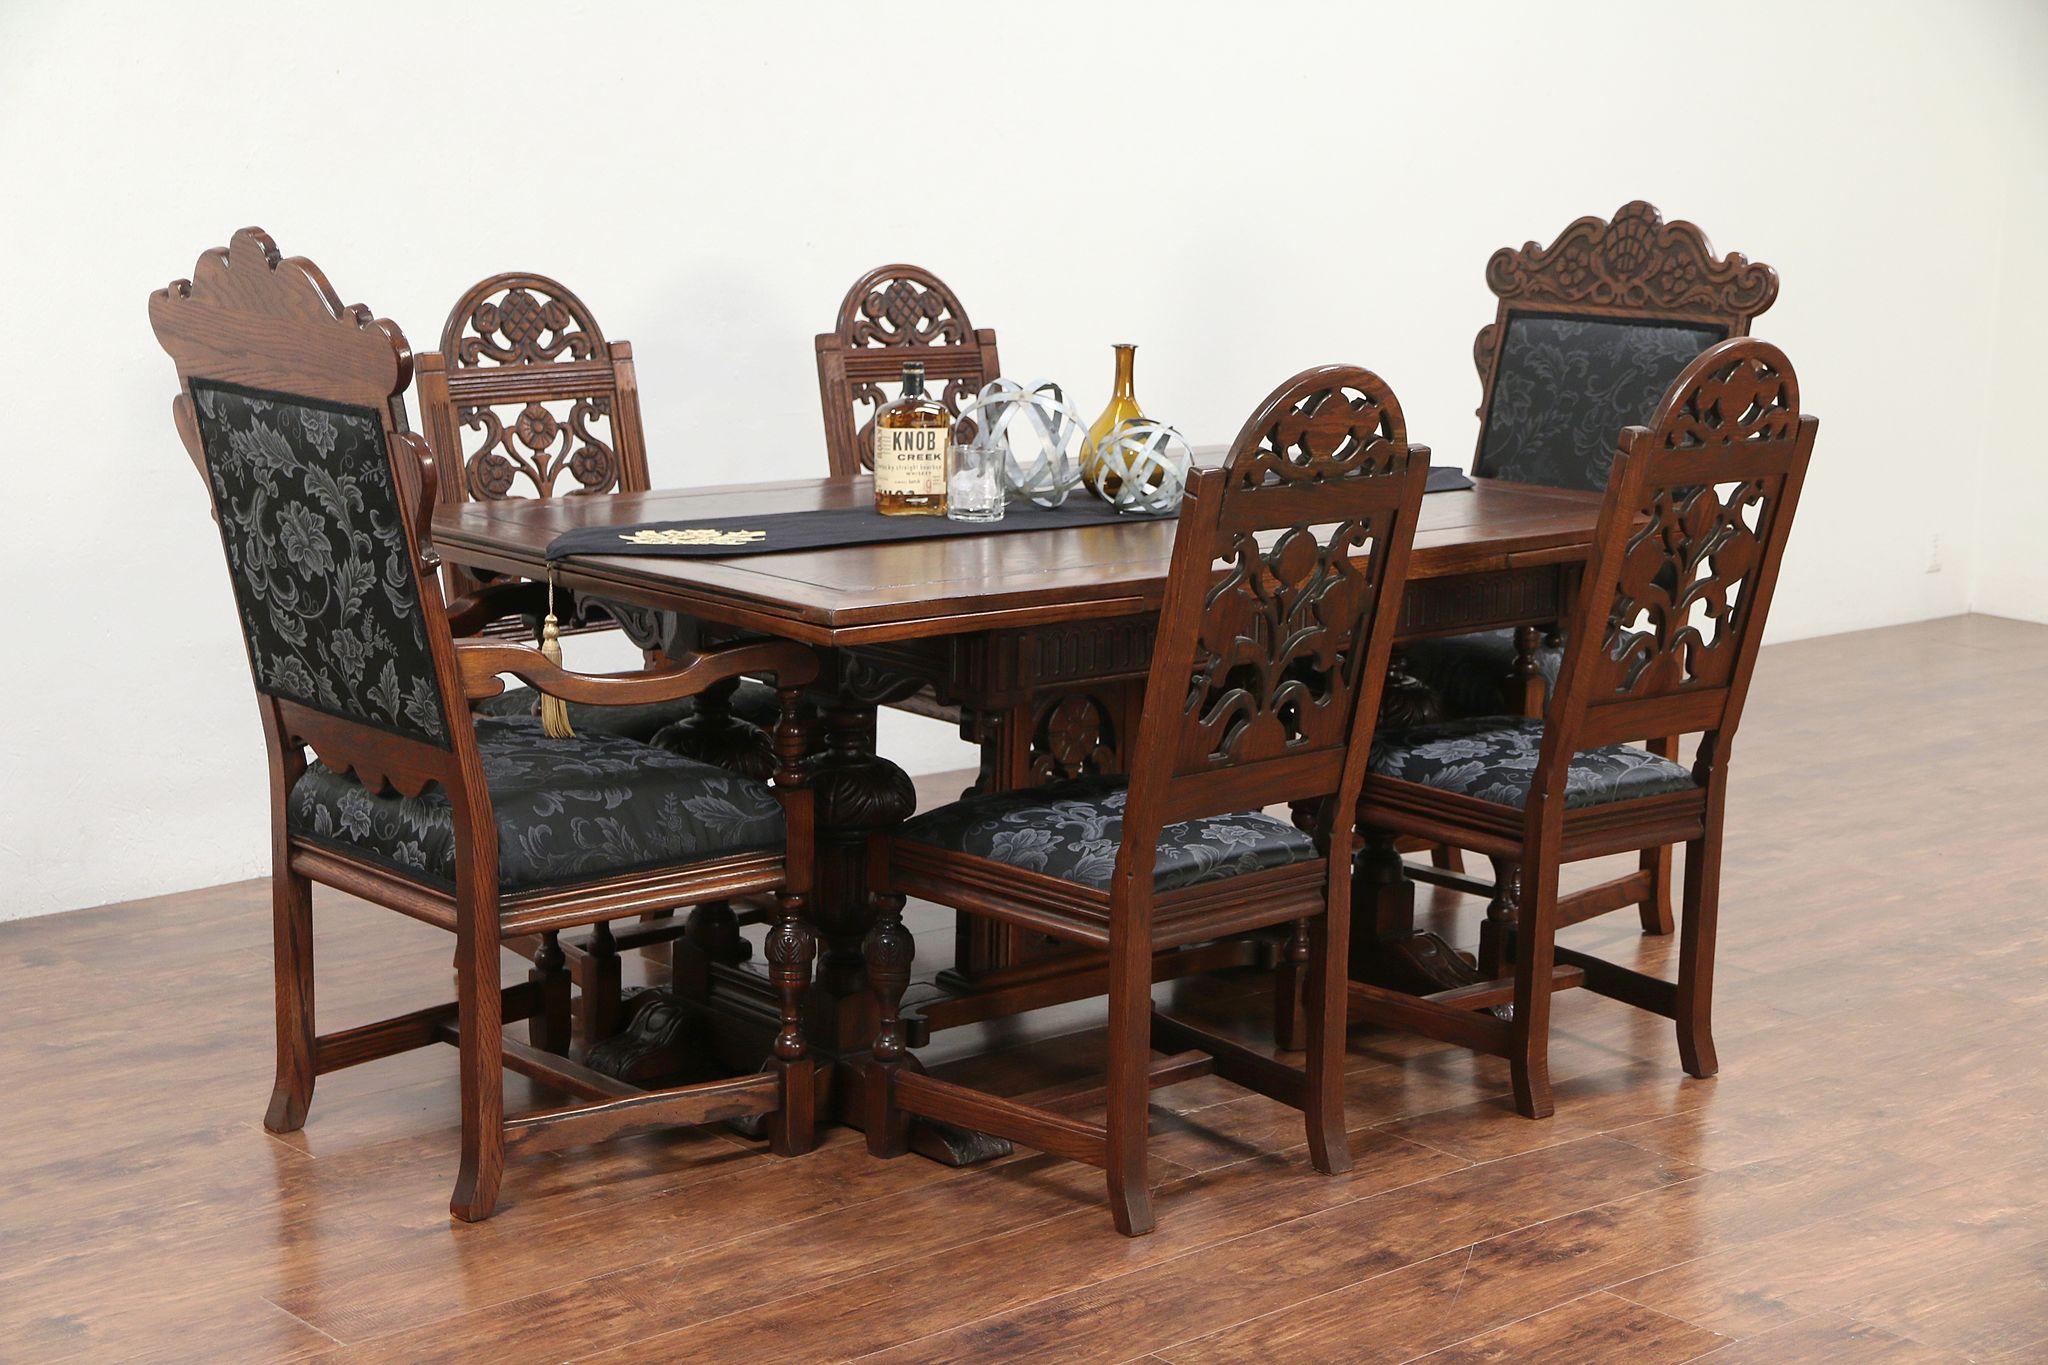 English Tudor Oak Dining Set, Table U0026 Leaves, 6 Chairs, New Upholstery  #29841 ...